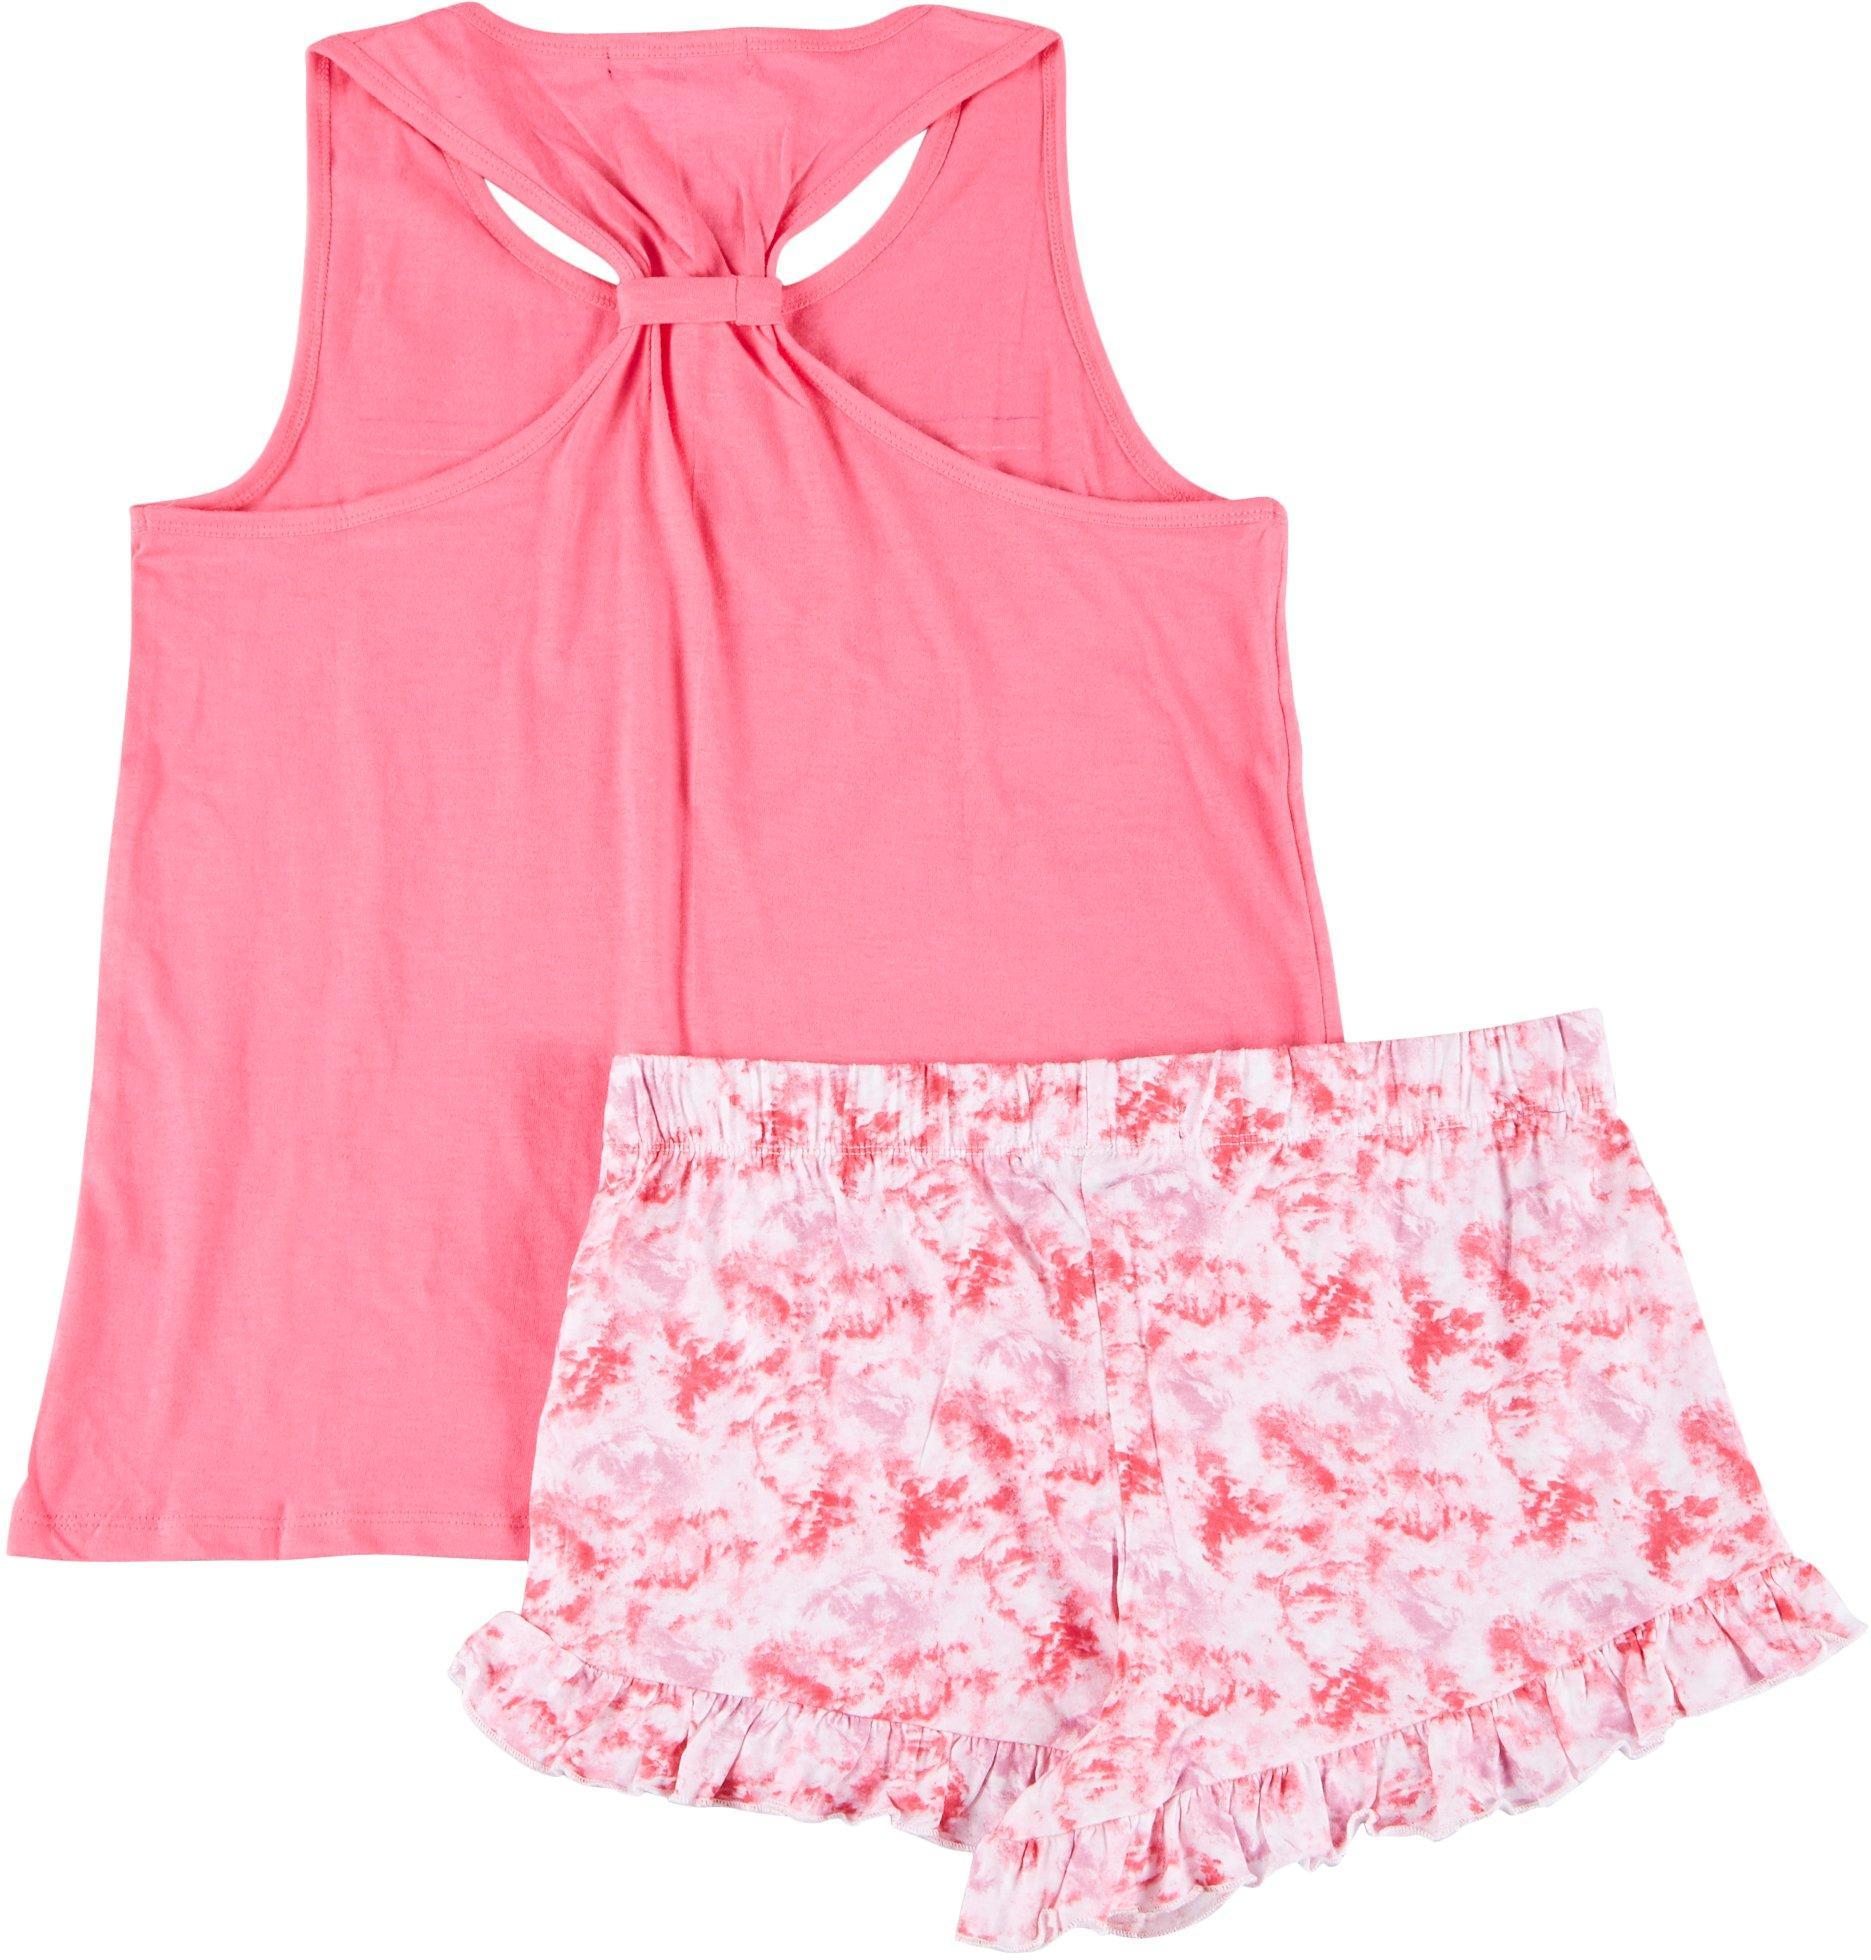 Derek Heart Juniors 2-Pc Tie Dye Pajama Set